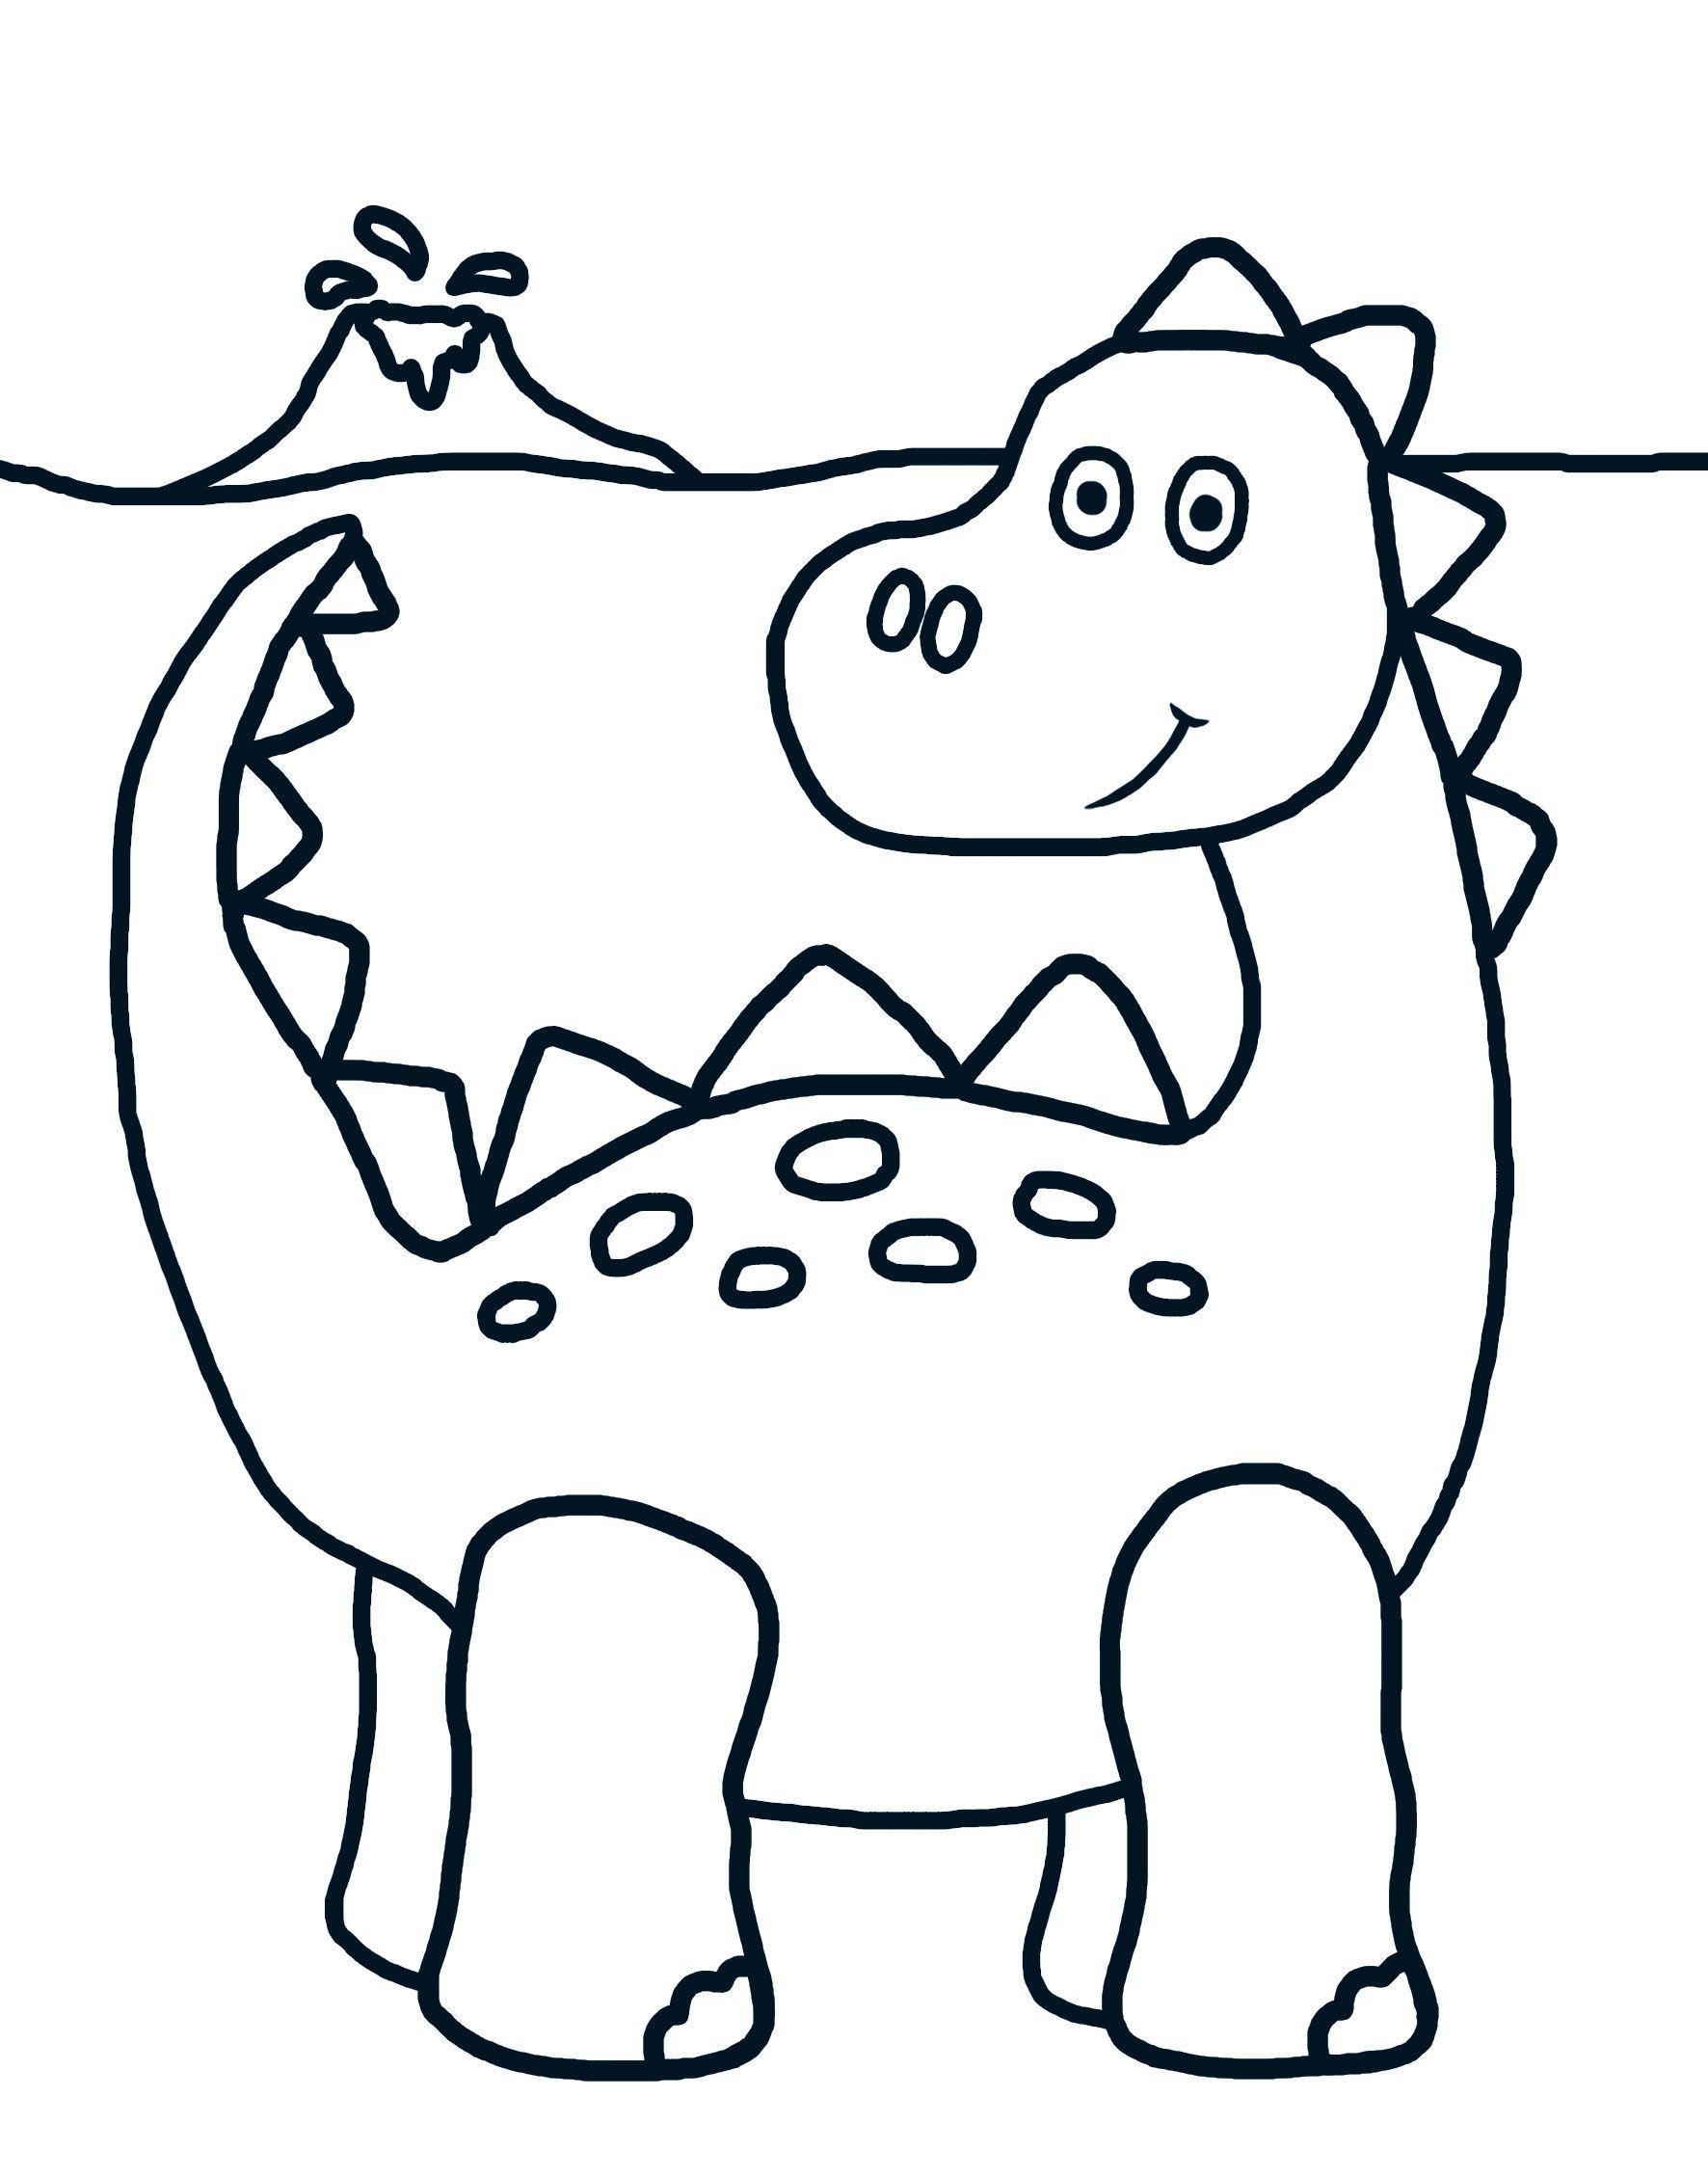 Dino-doodle-colouring | Dinosaur Party Ideas | Pinterest | Doodle ...